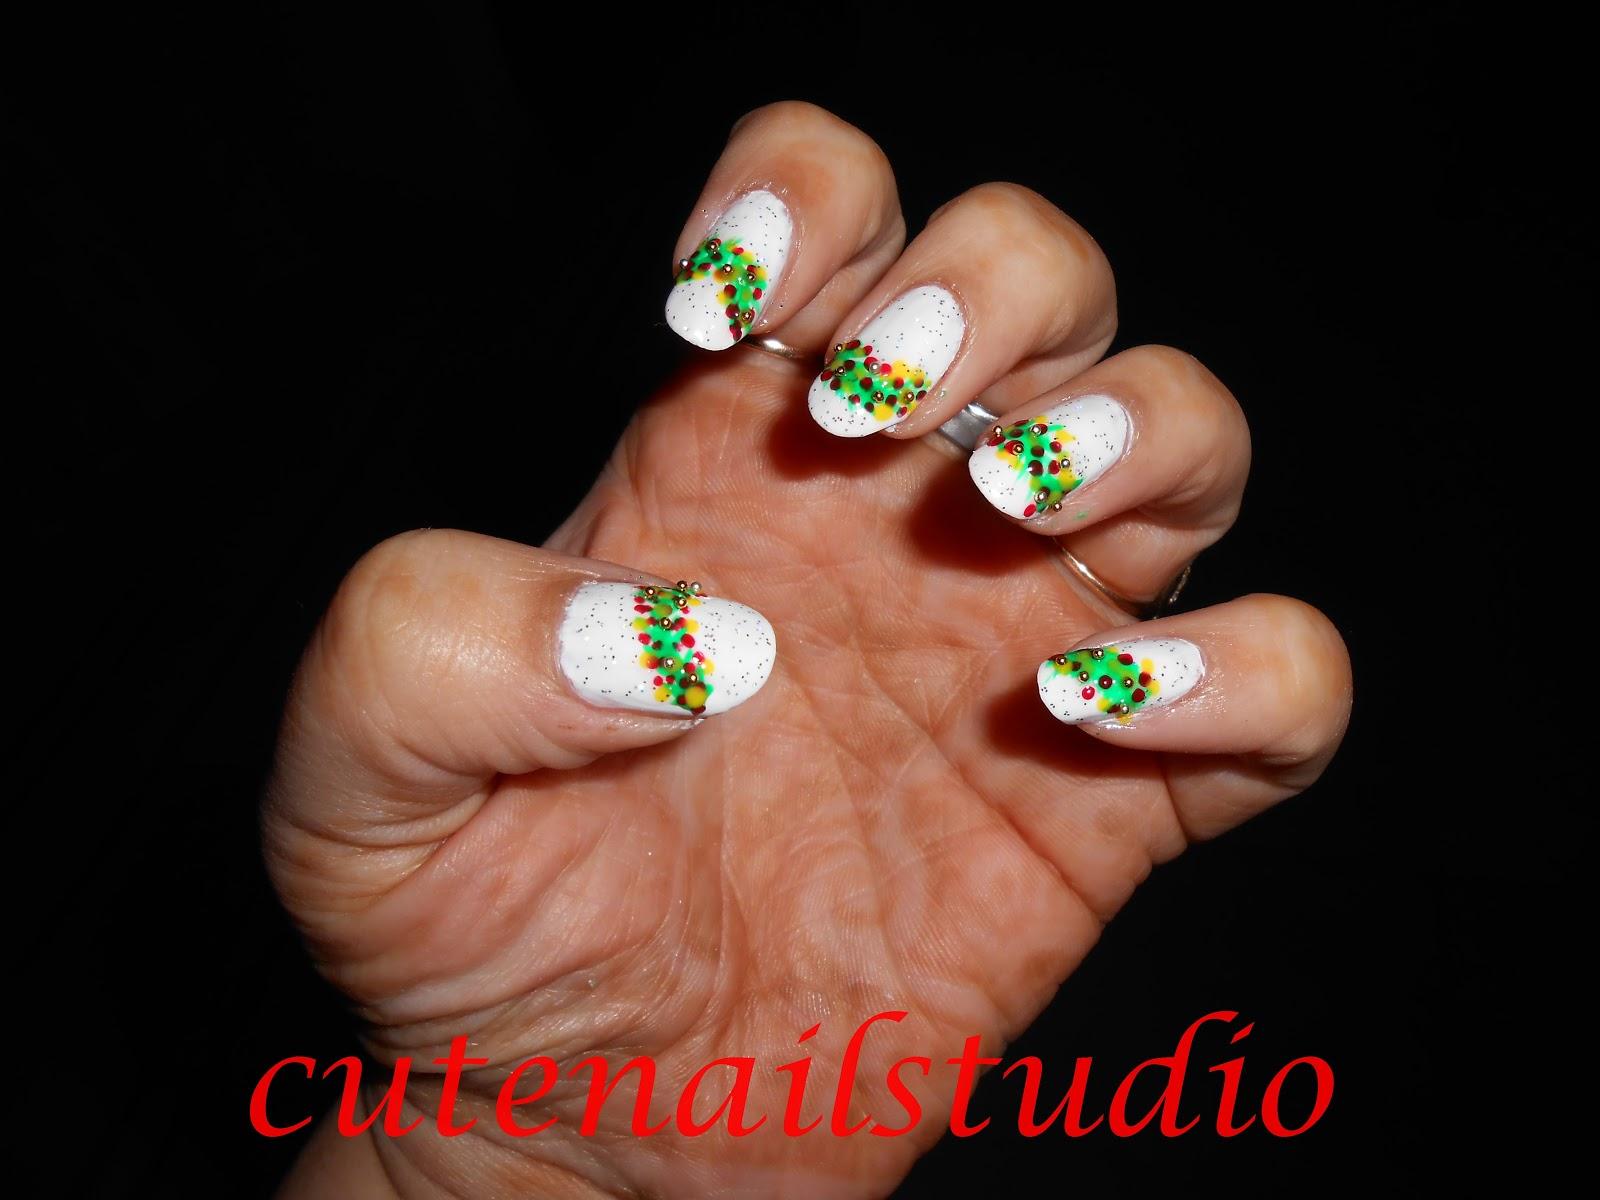 Cute nails: Christmas nail art challenge day 5: Christmas decorations.